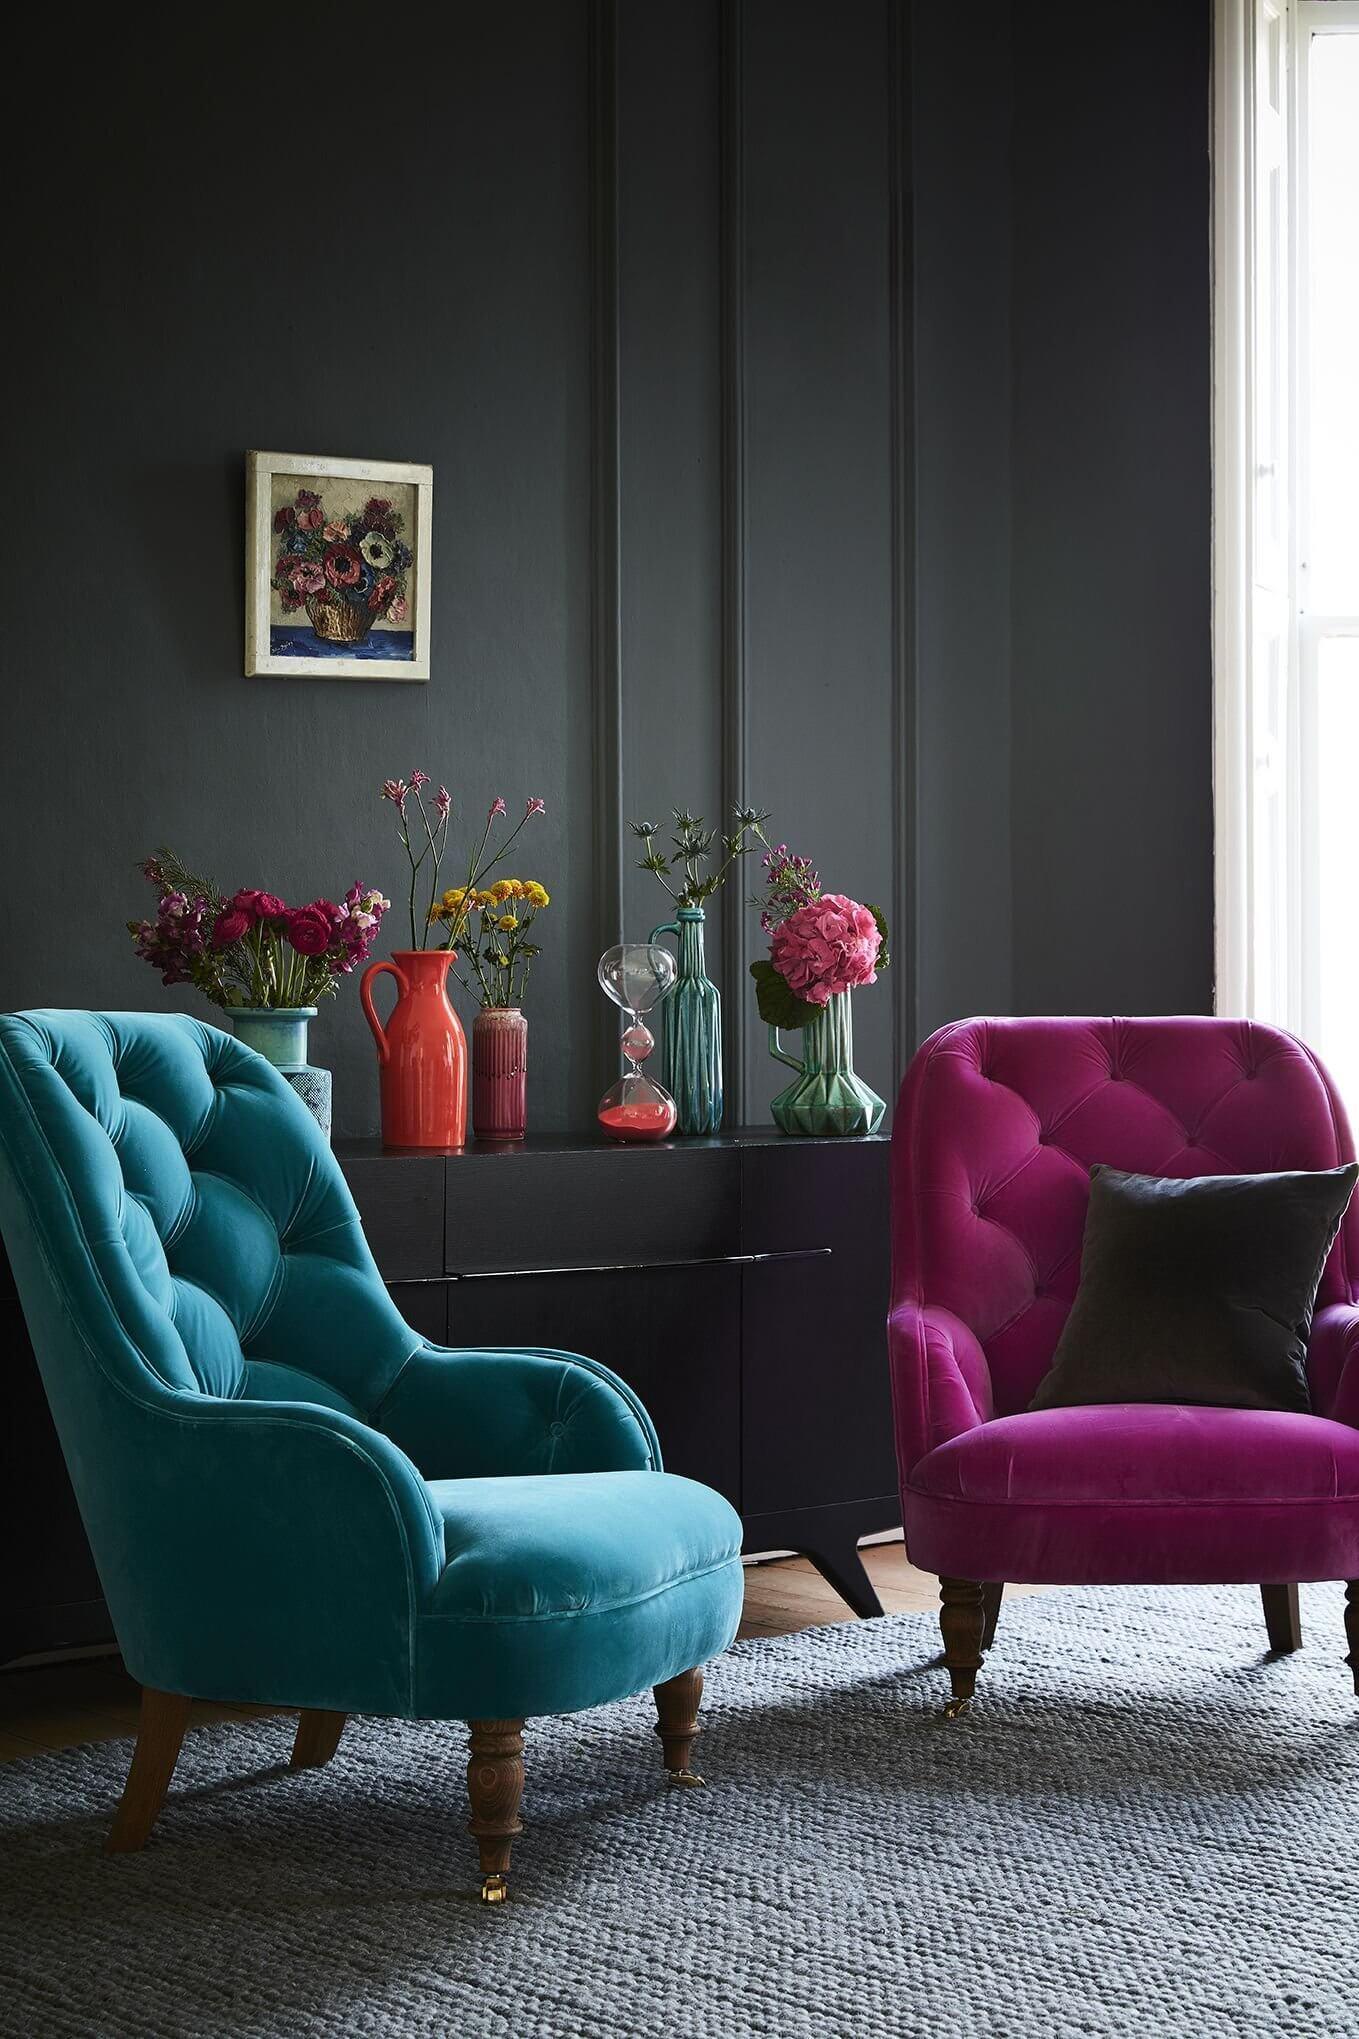 Poltrona capitonê azul e roxo